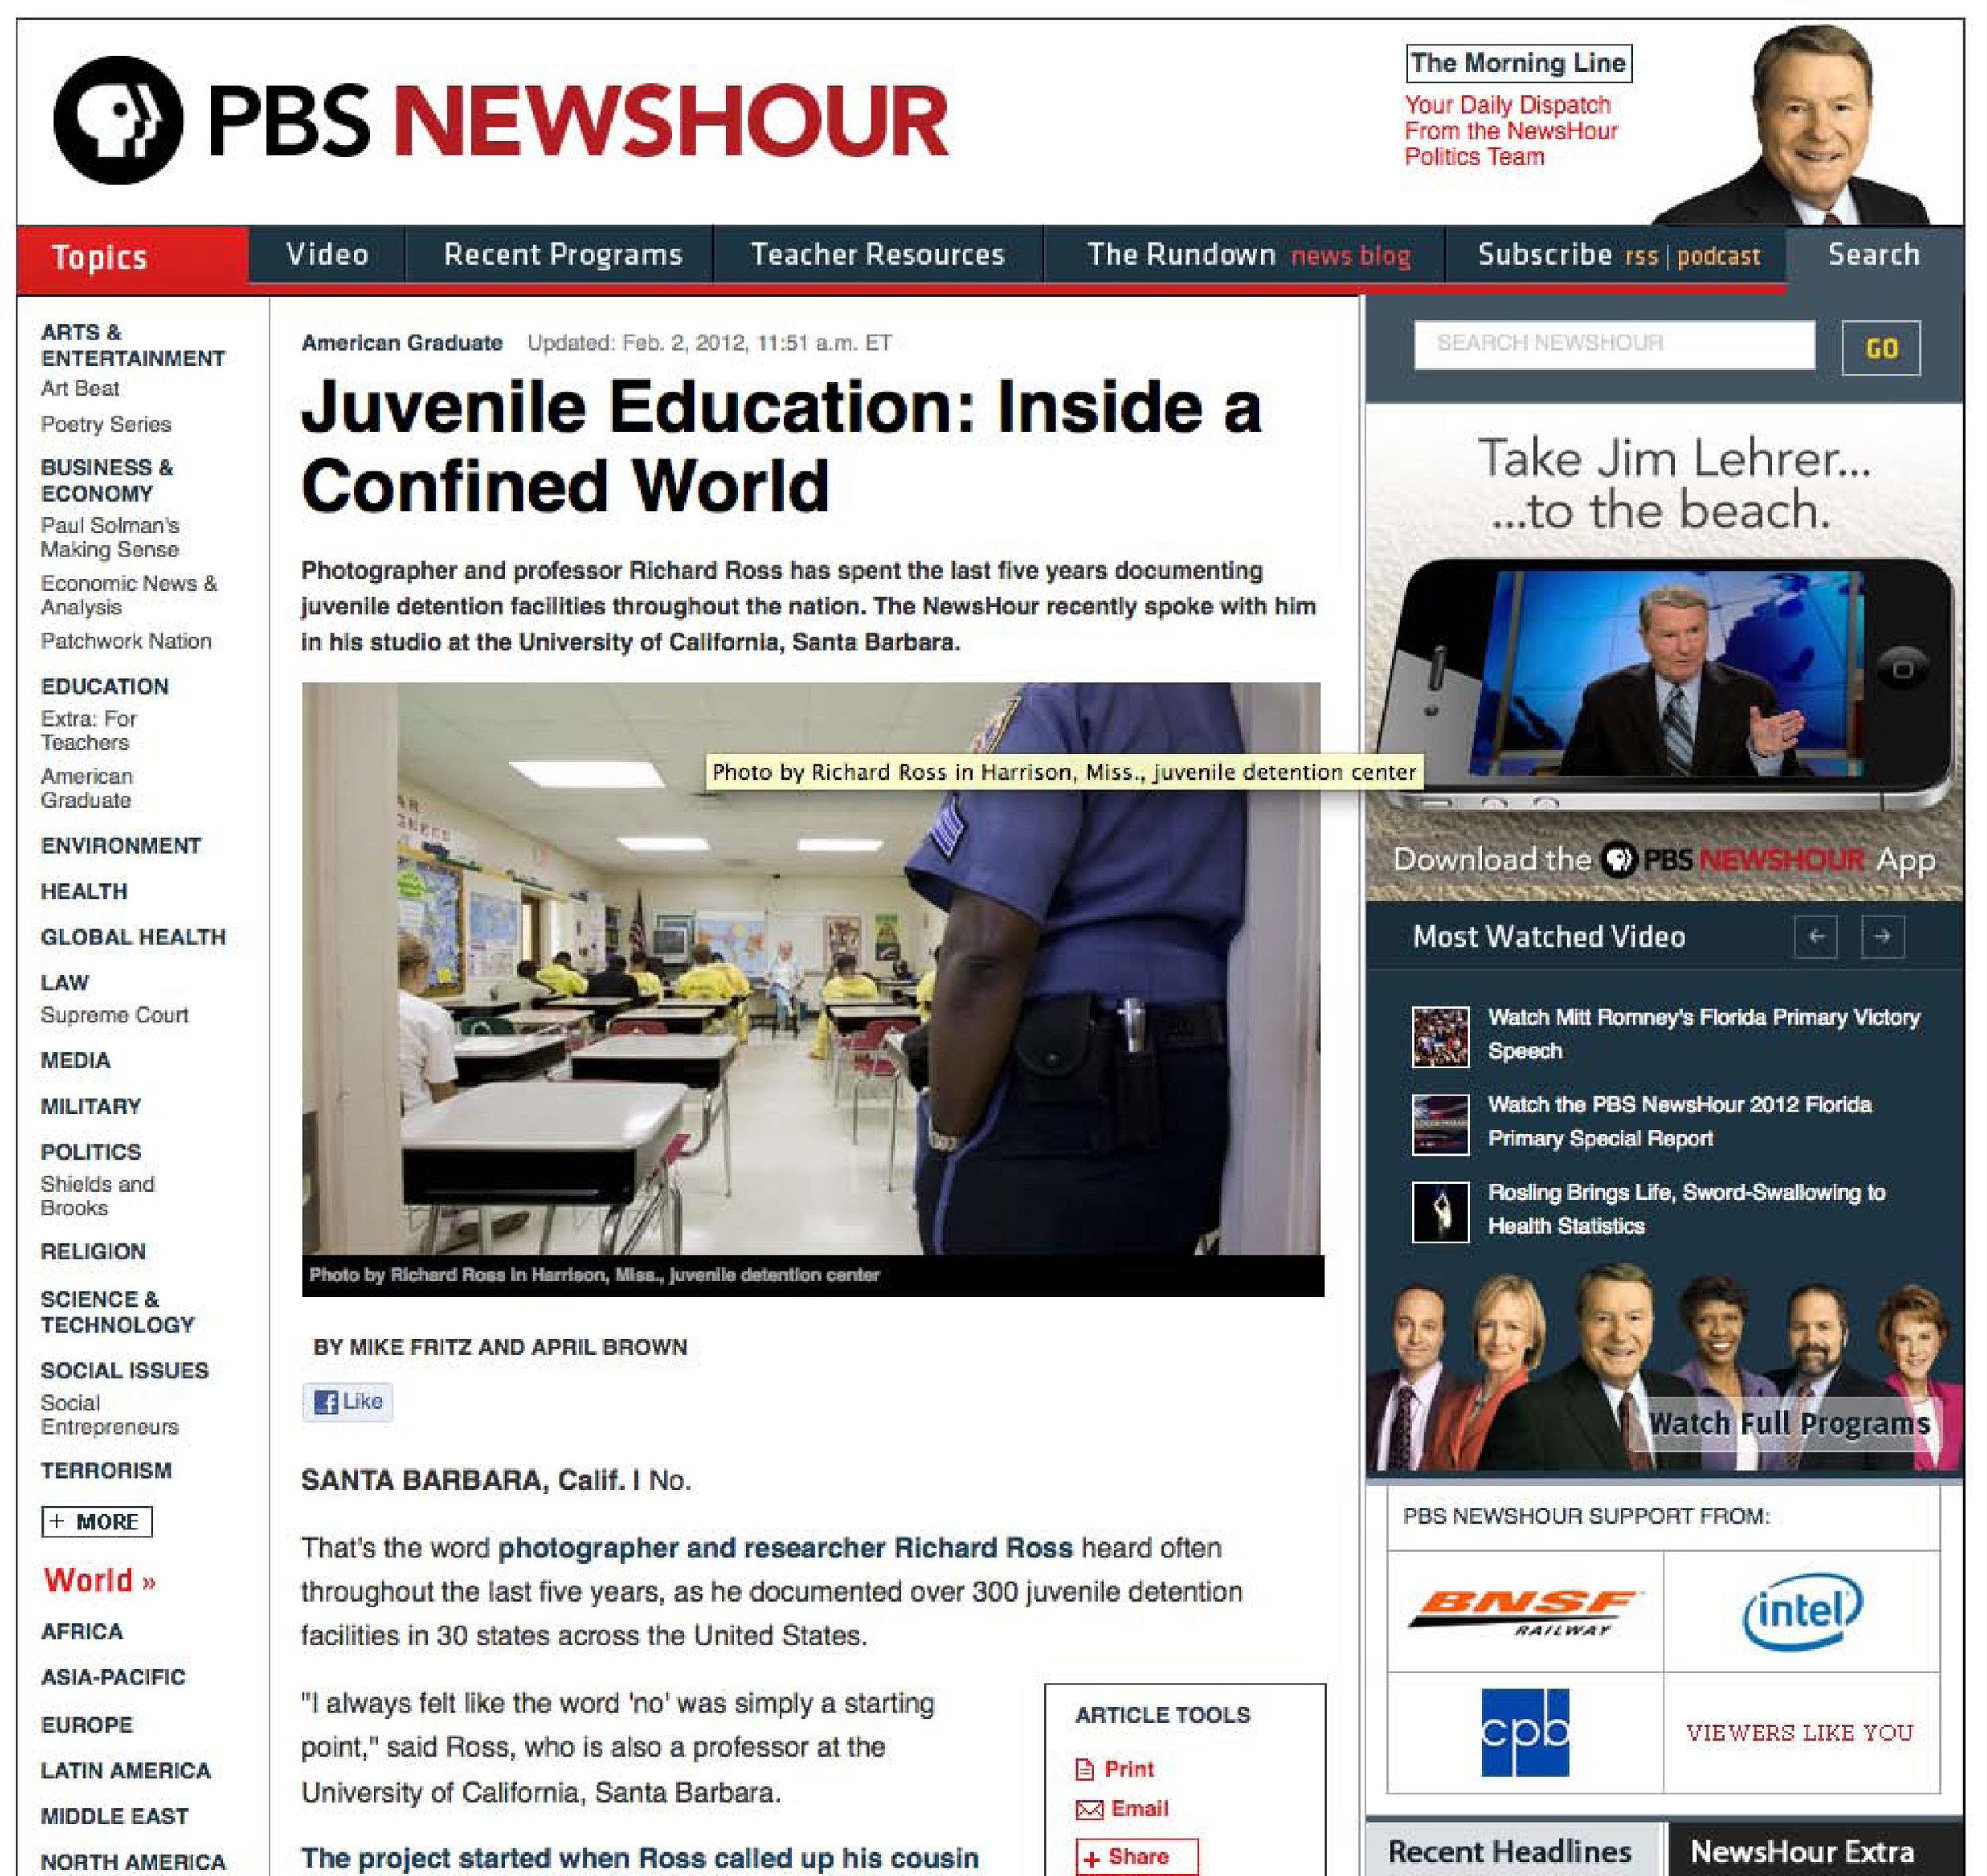 PBSNewshour-1.jpg